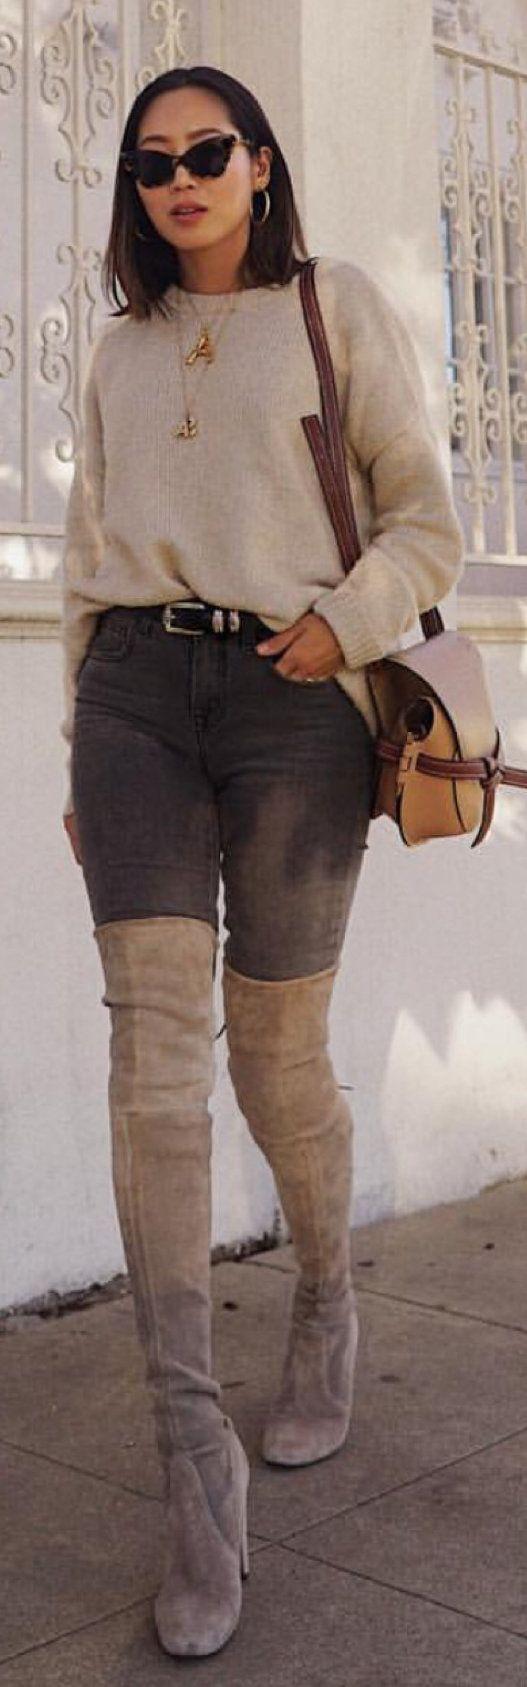 gray thigh high boots